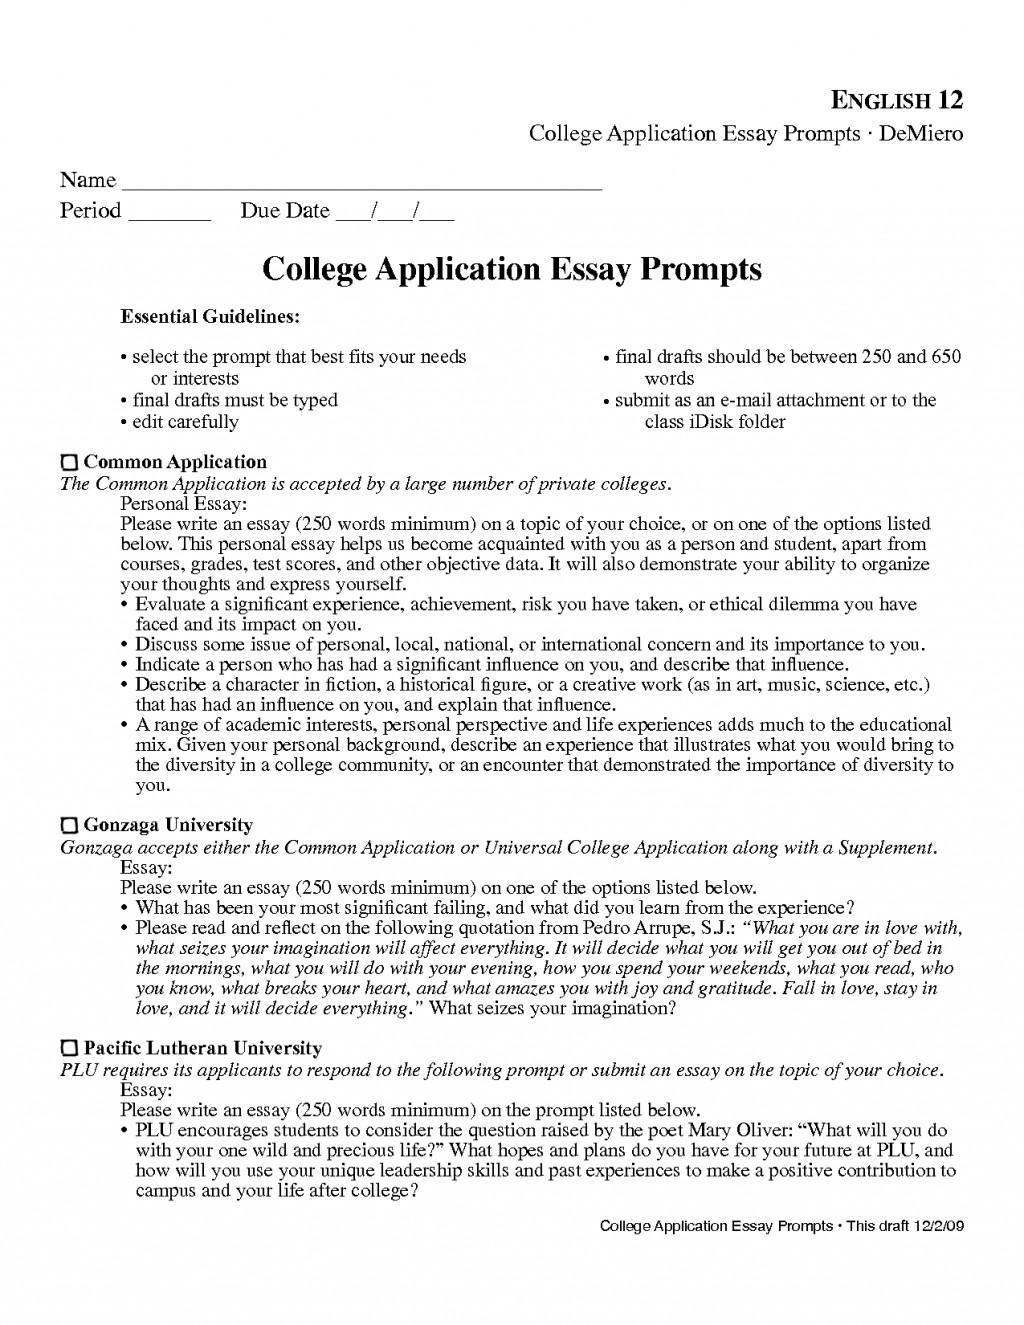 Common application essay help maximum words